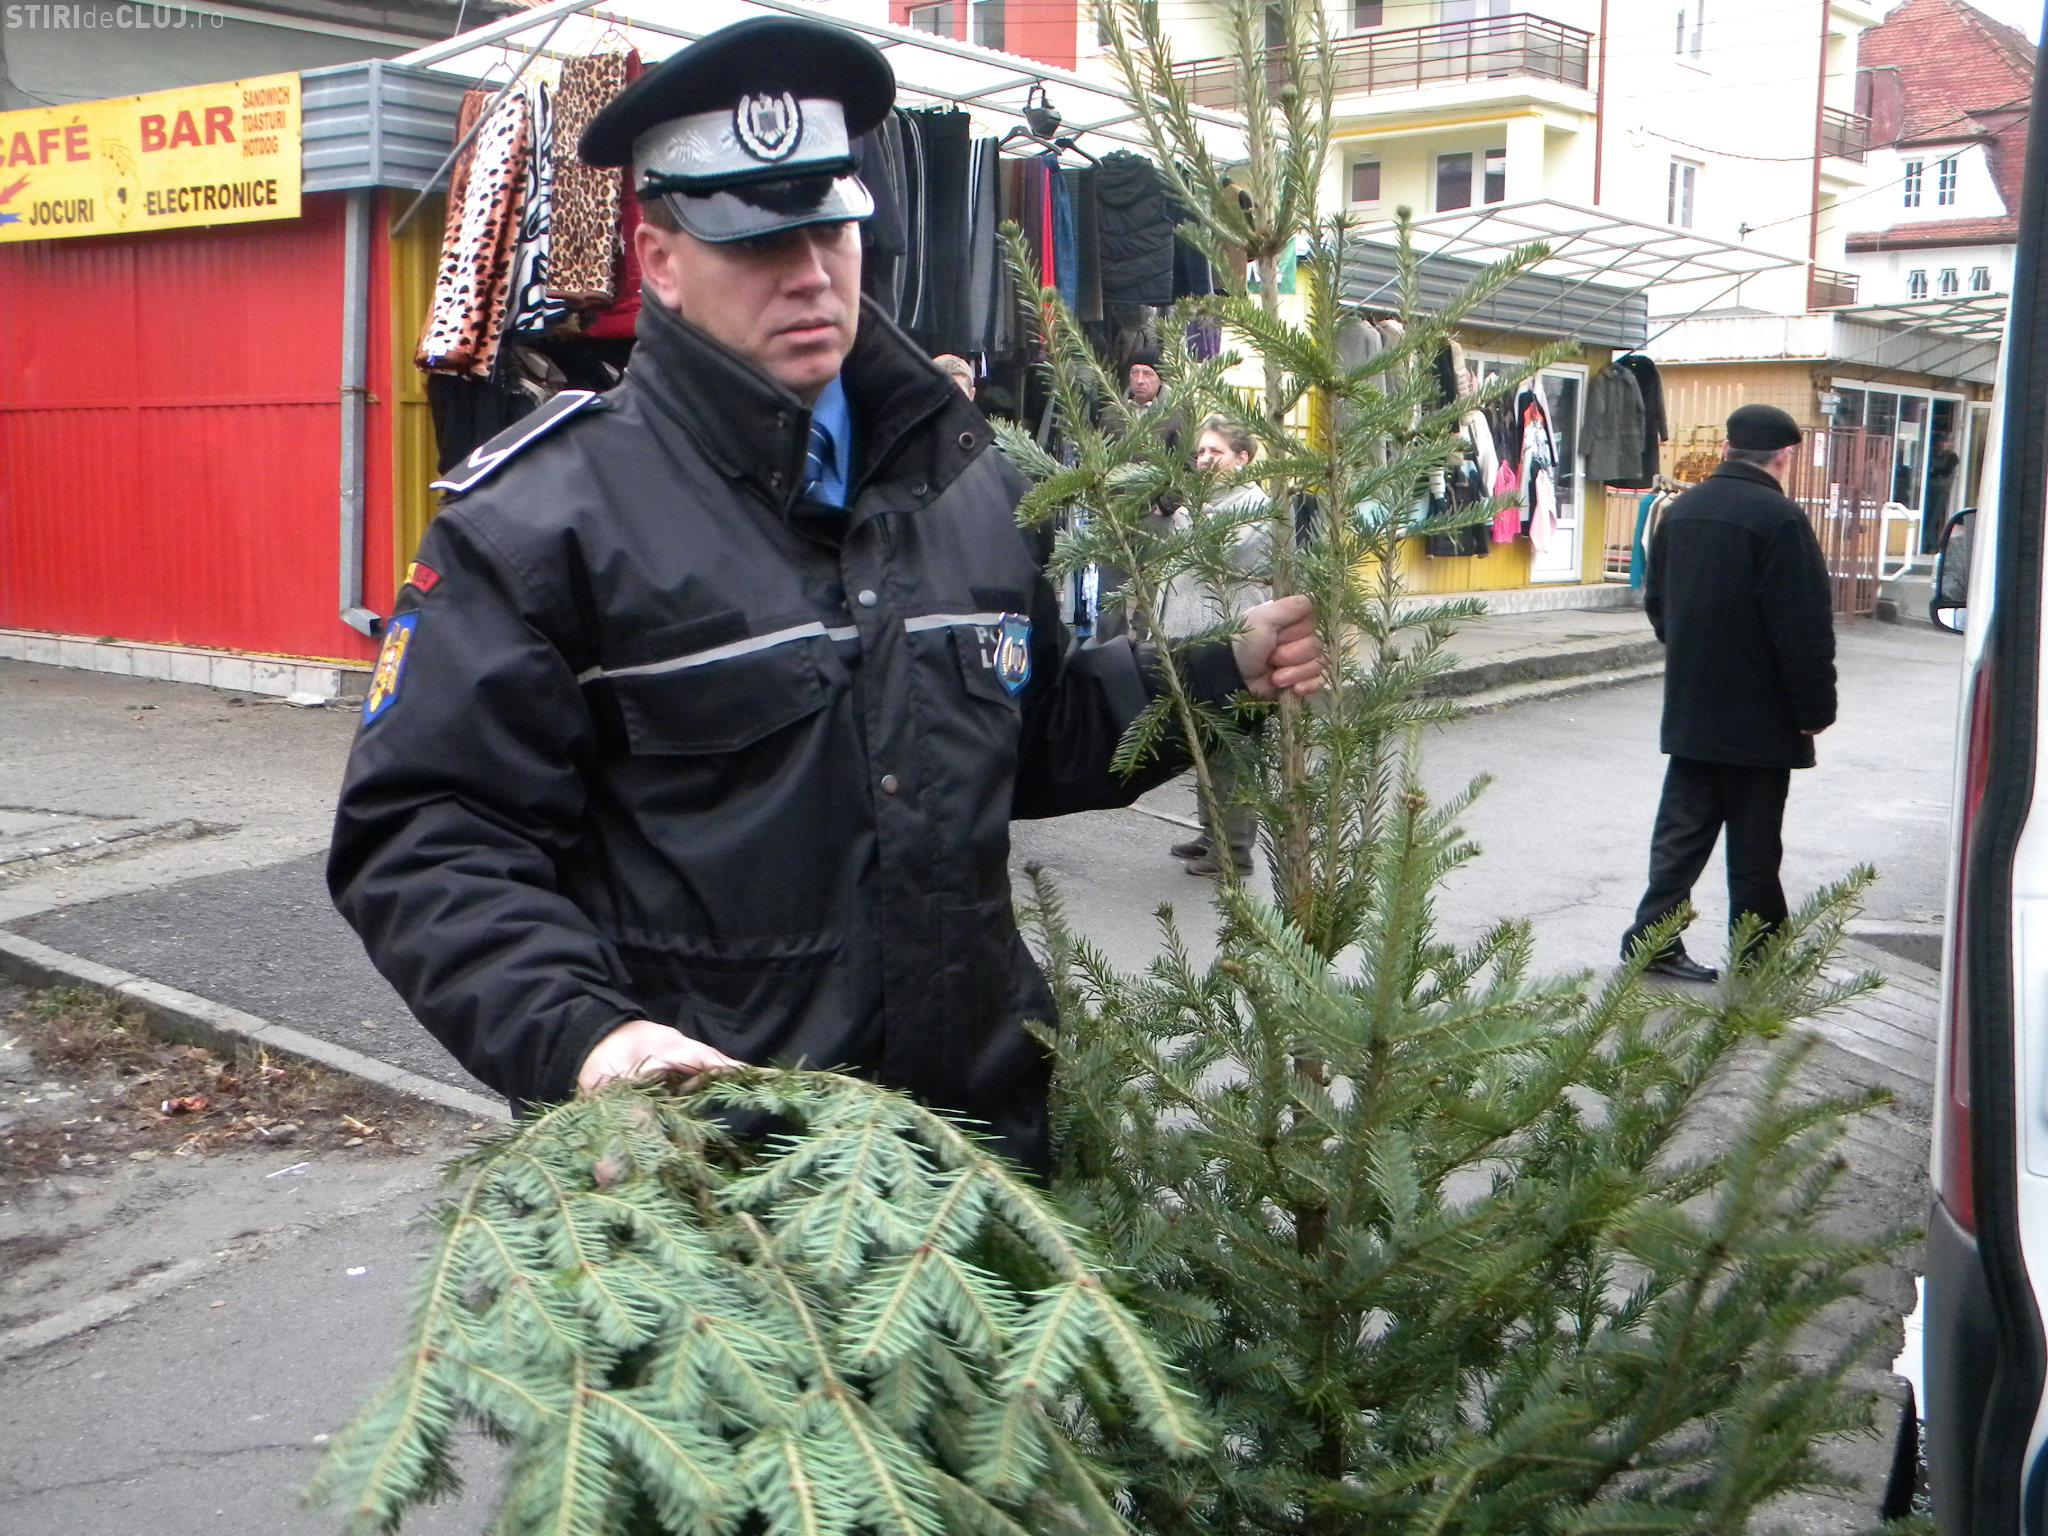 Politia locala a confiscat brazi de Craciun si mii de petarde